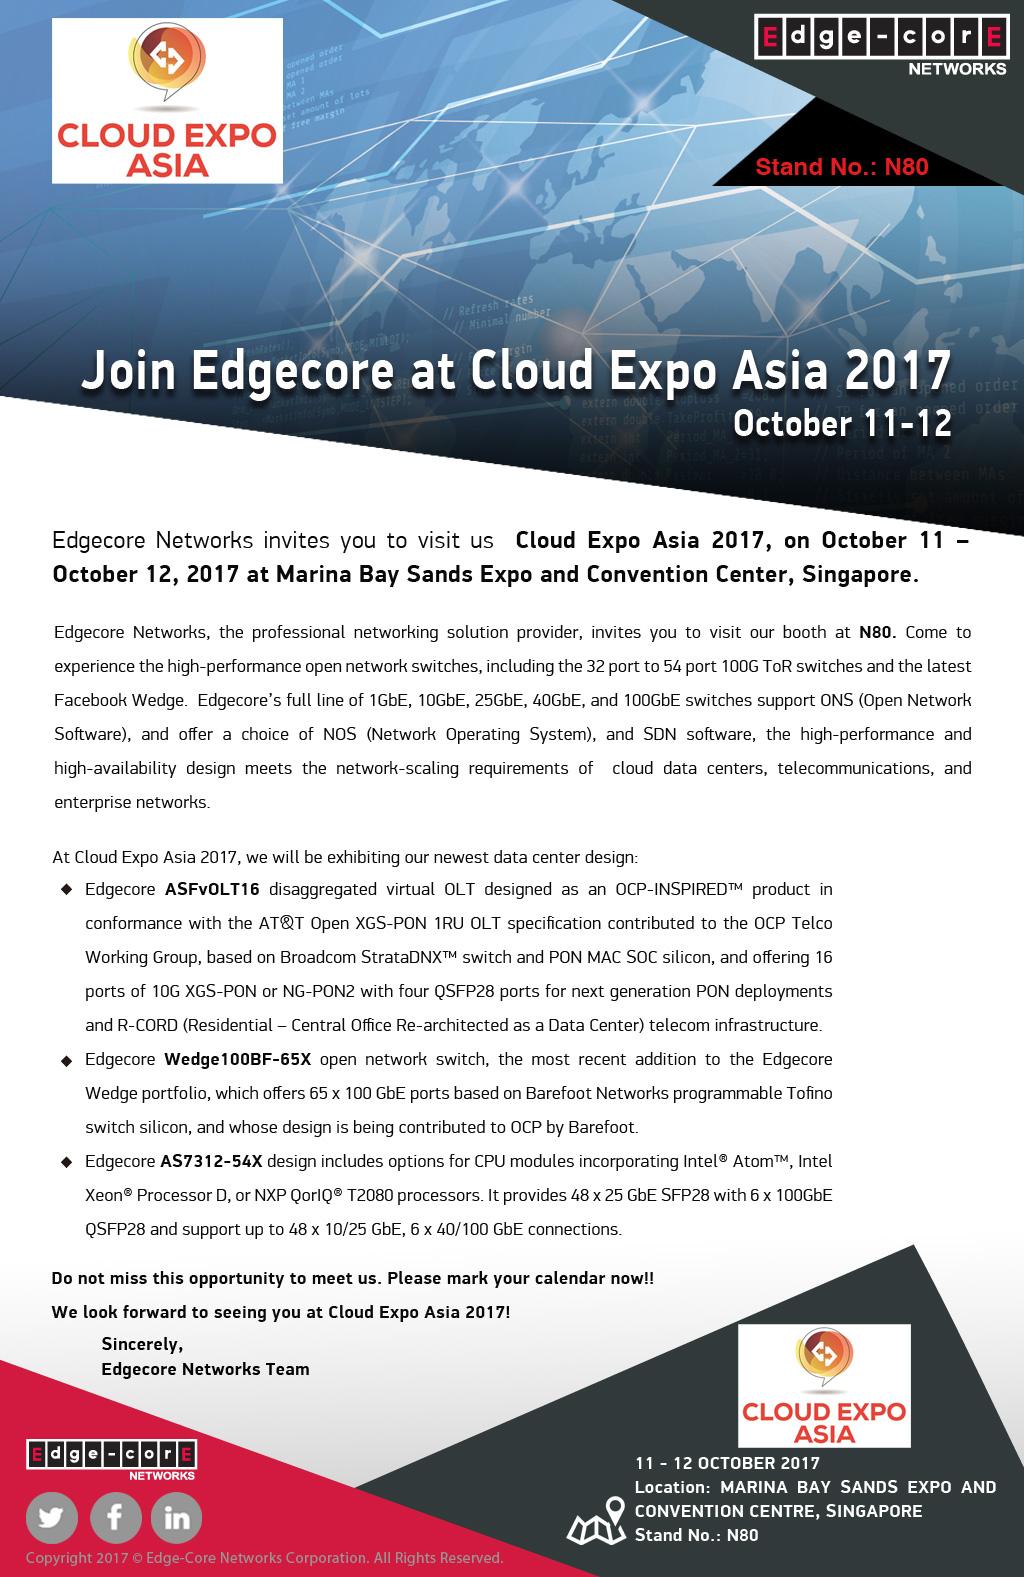 Cloud-Expo-Asia-2017-10_Invitation-card_1024.jpg